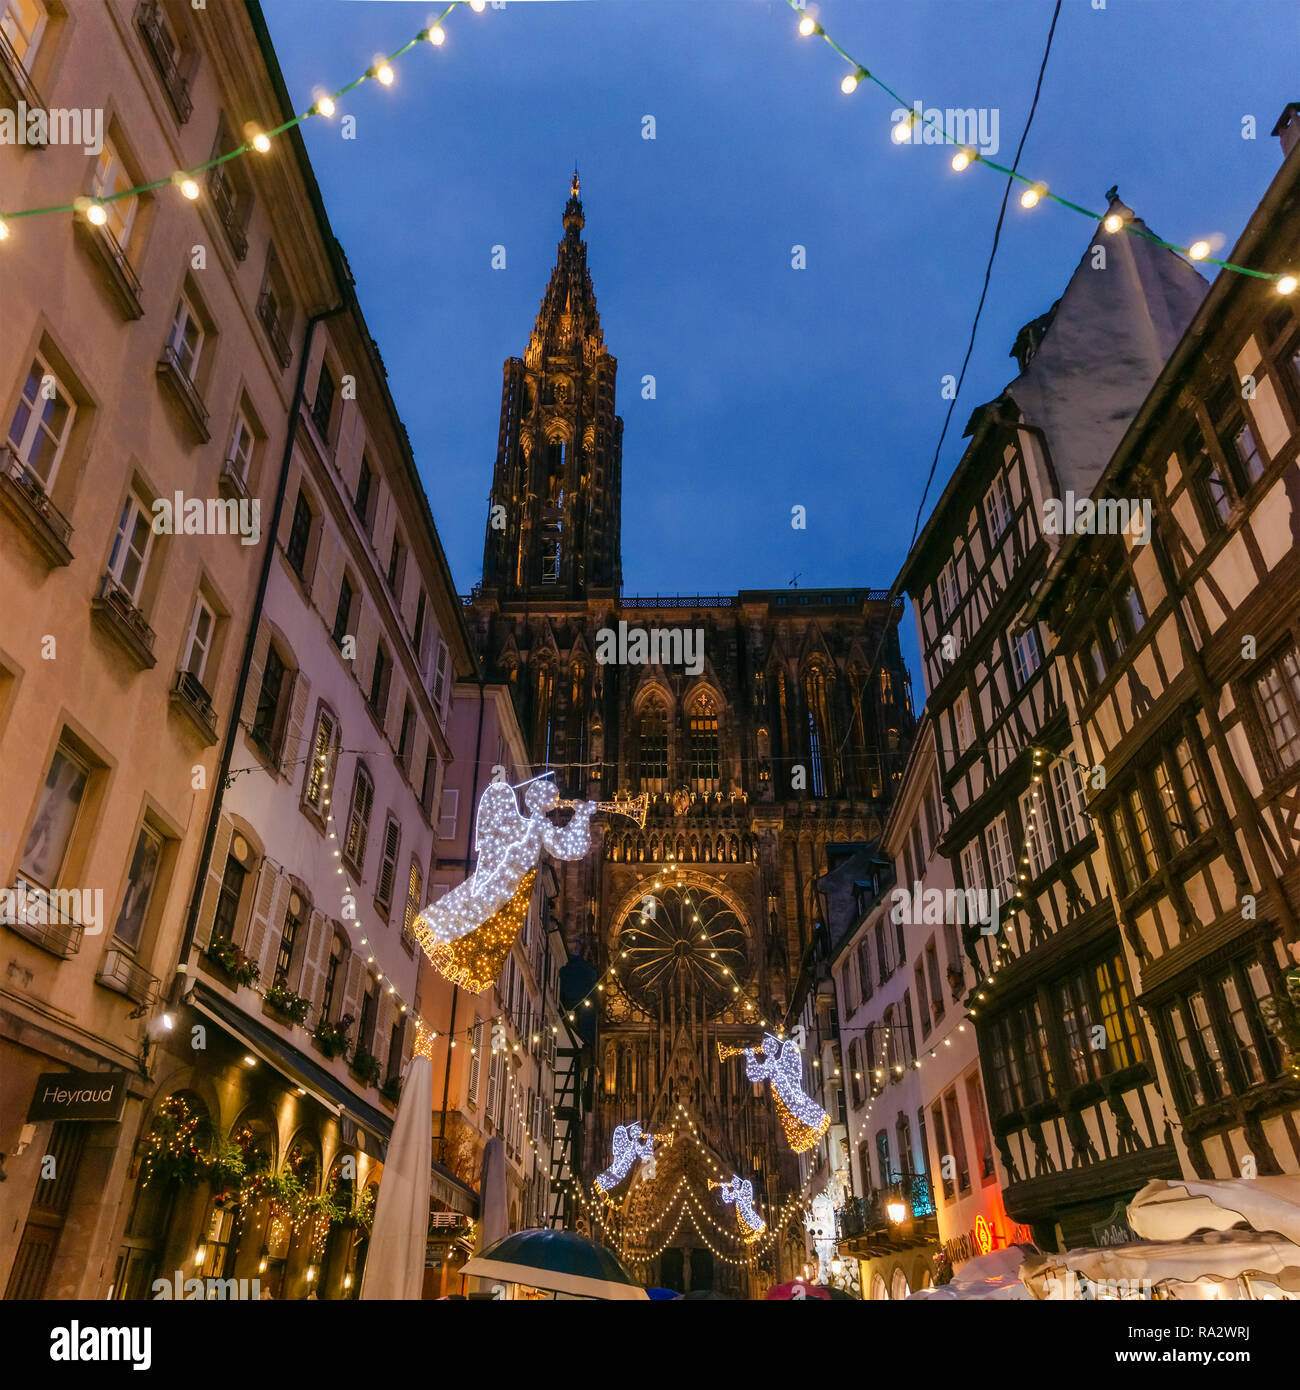 Strasbourg Holiday Decorations Stock Photos & Strasbourg